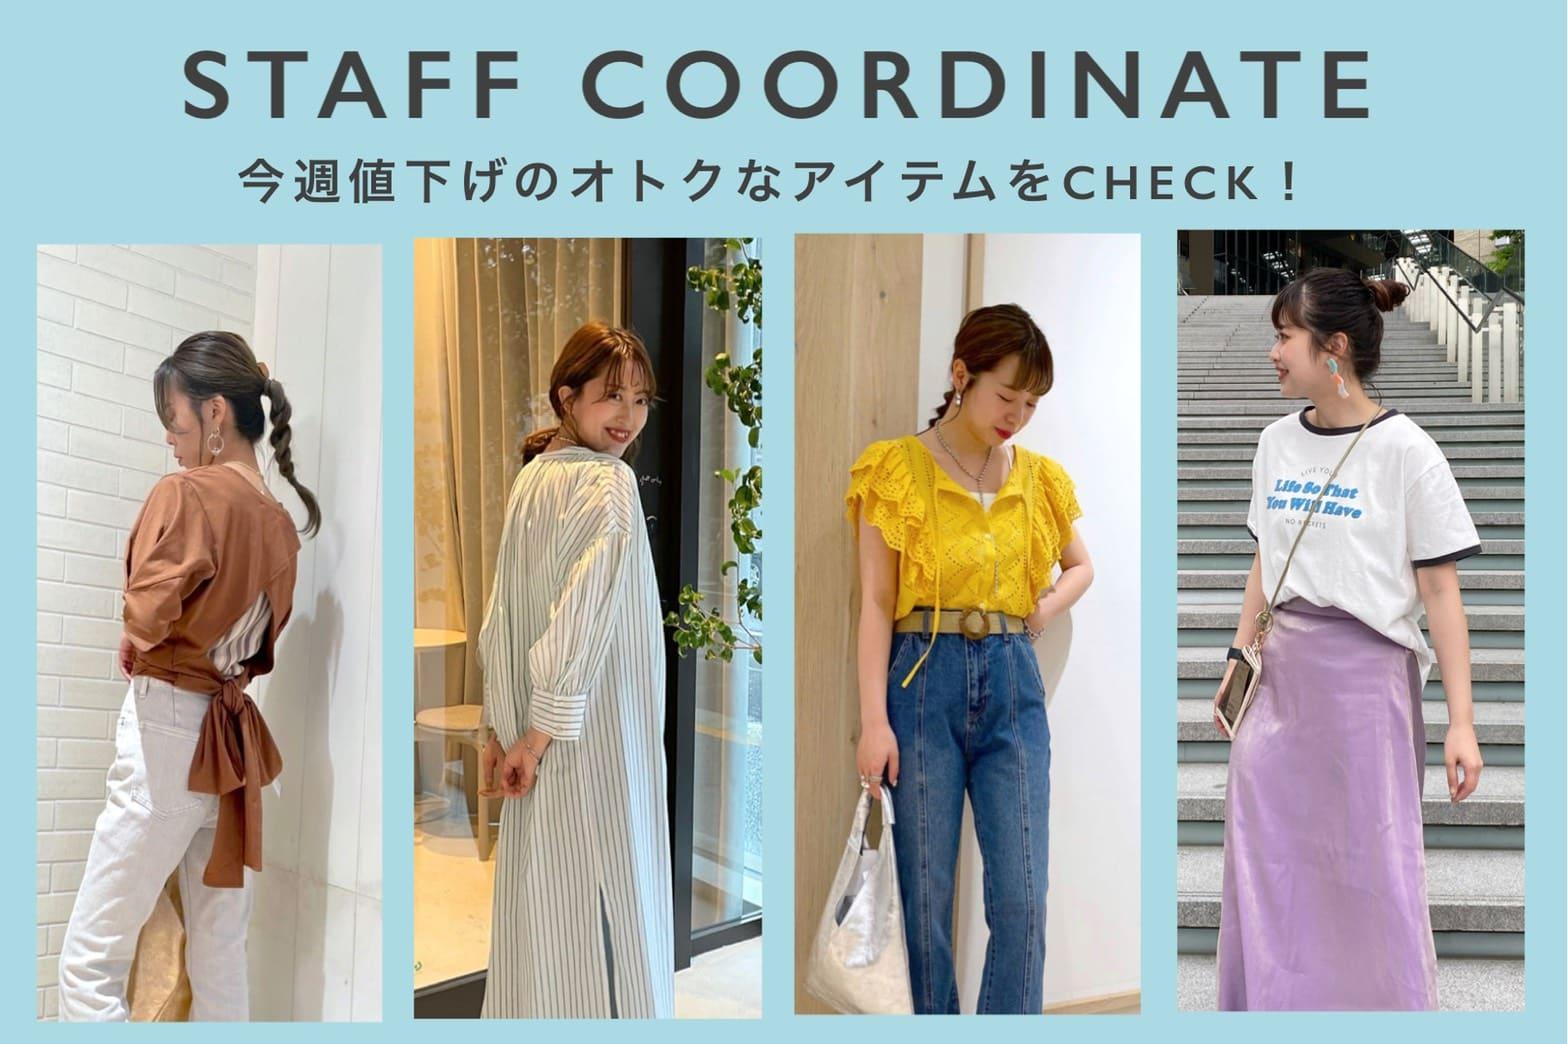 Discoat 【STAFF COORDINATE】今週値下げのオトクなアイテムをCHECK!